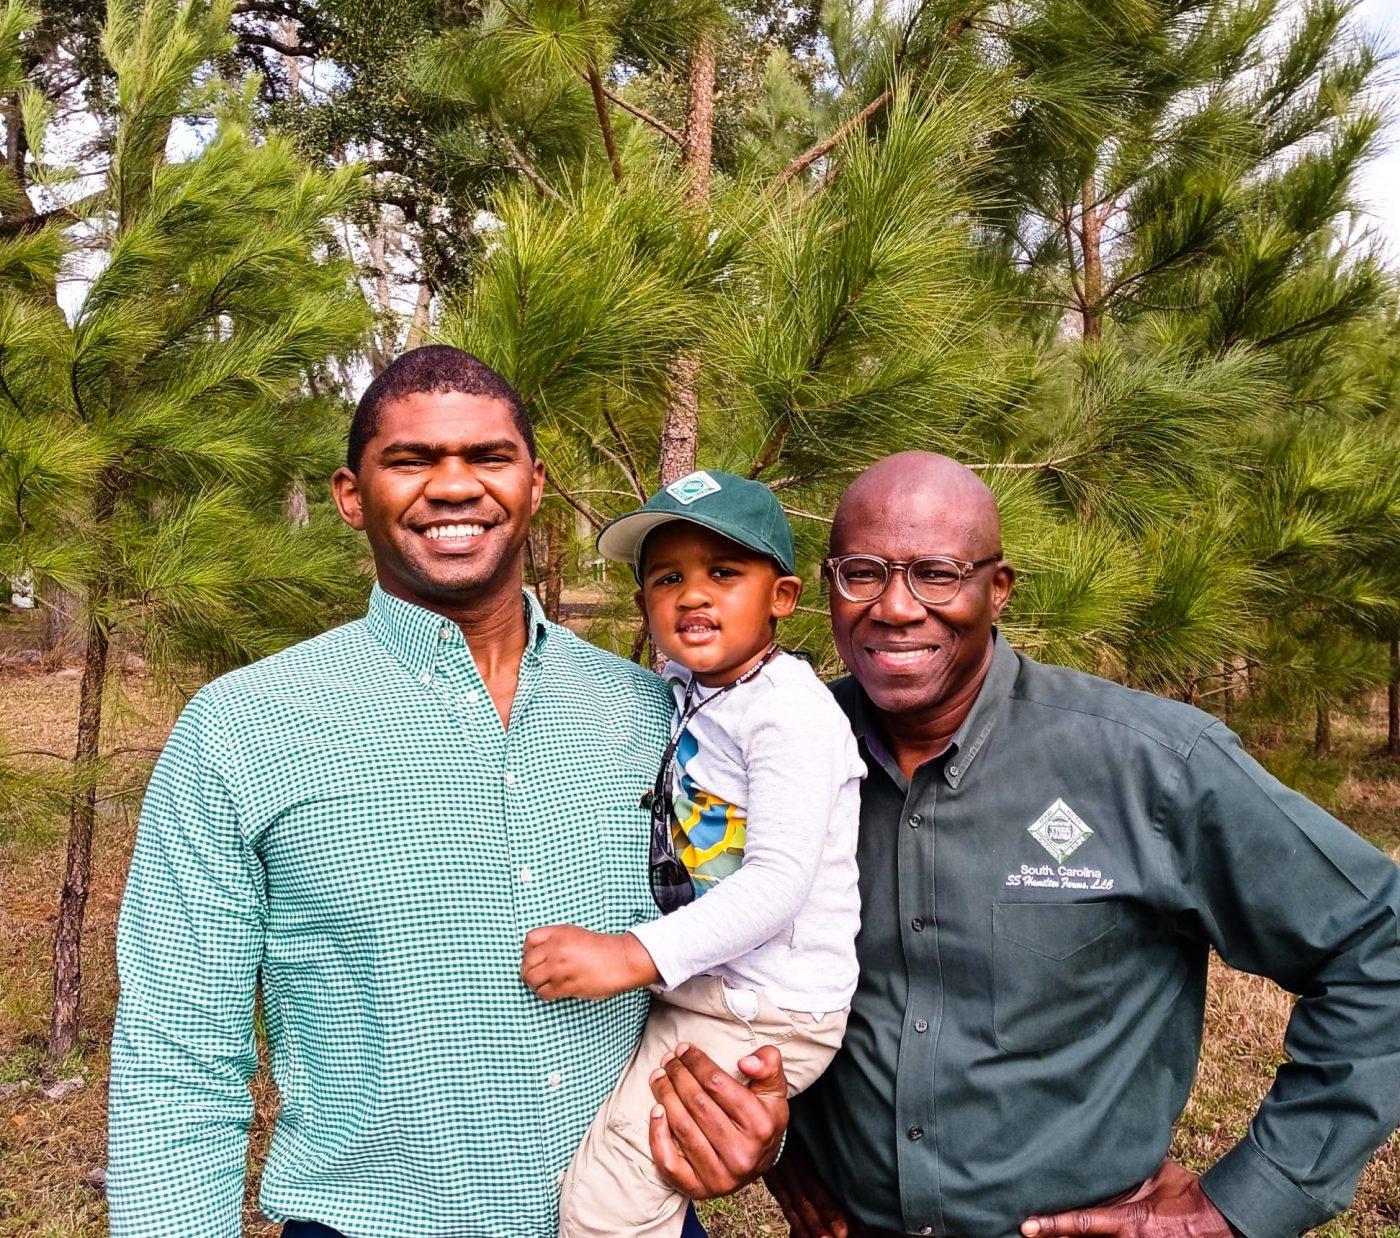 Joe Hamilton, his son and his grandson